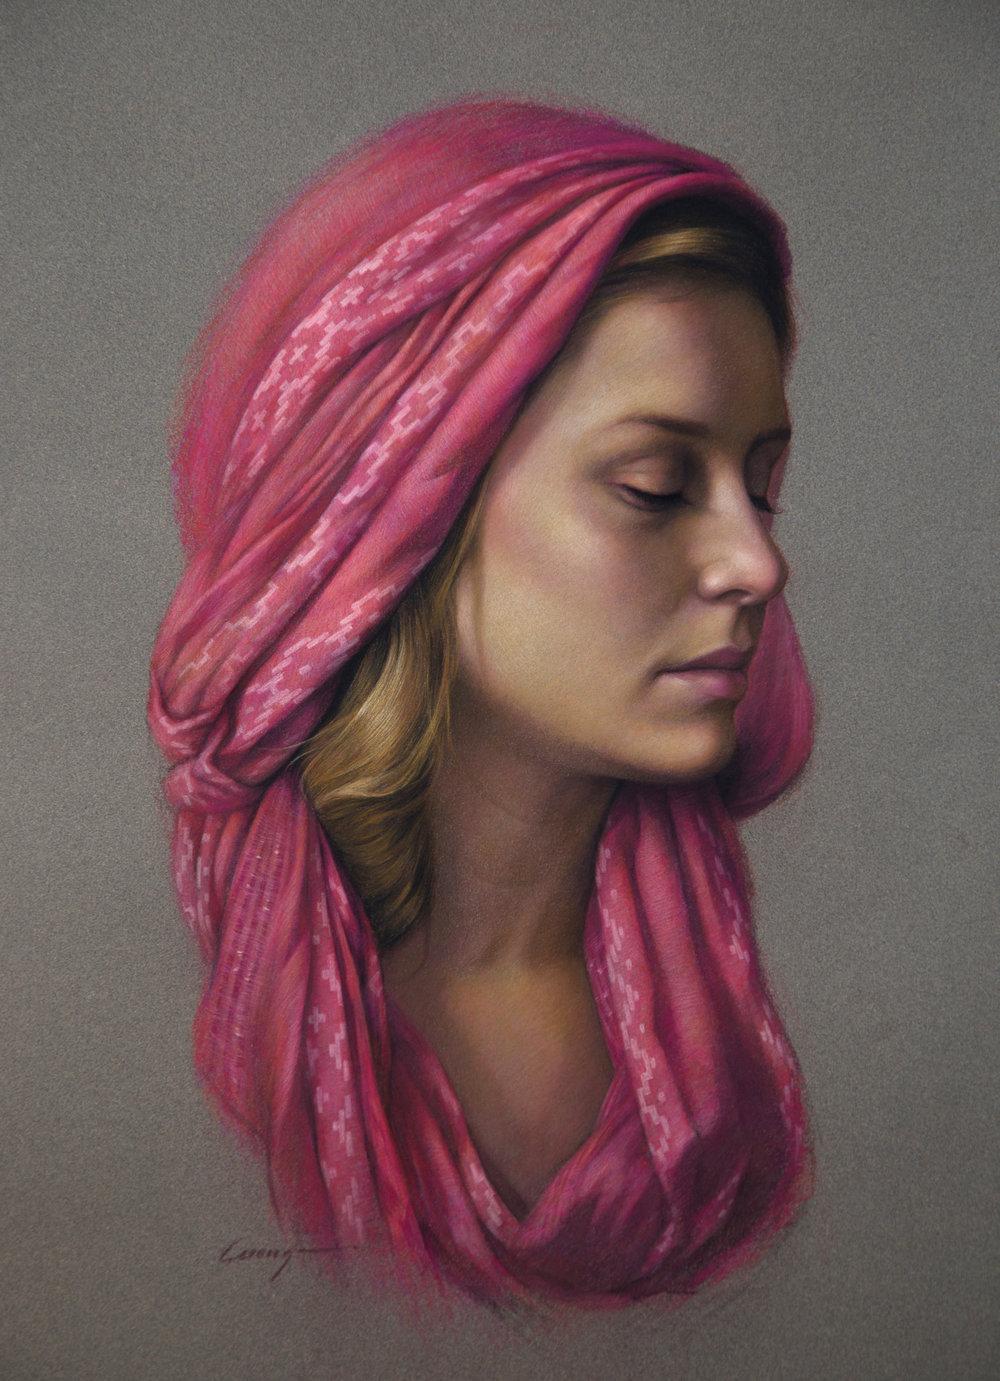 Redscarf.jpg